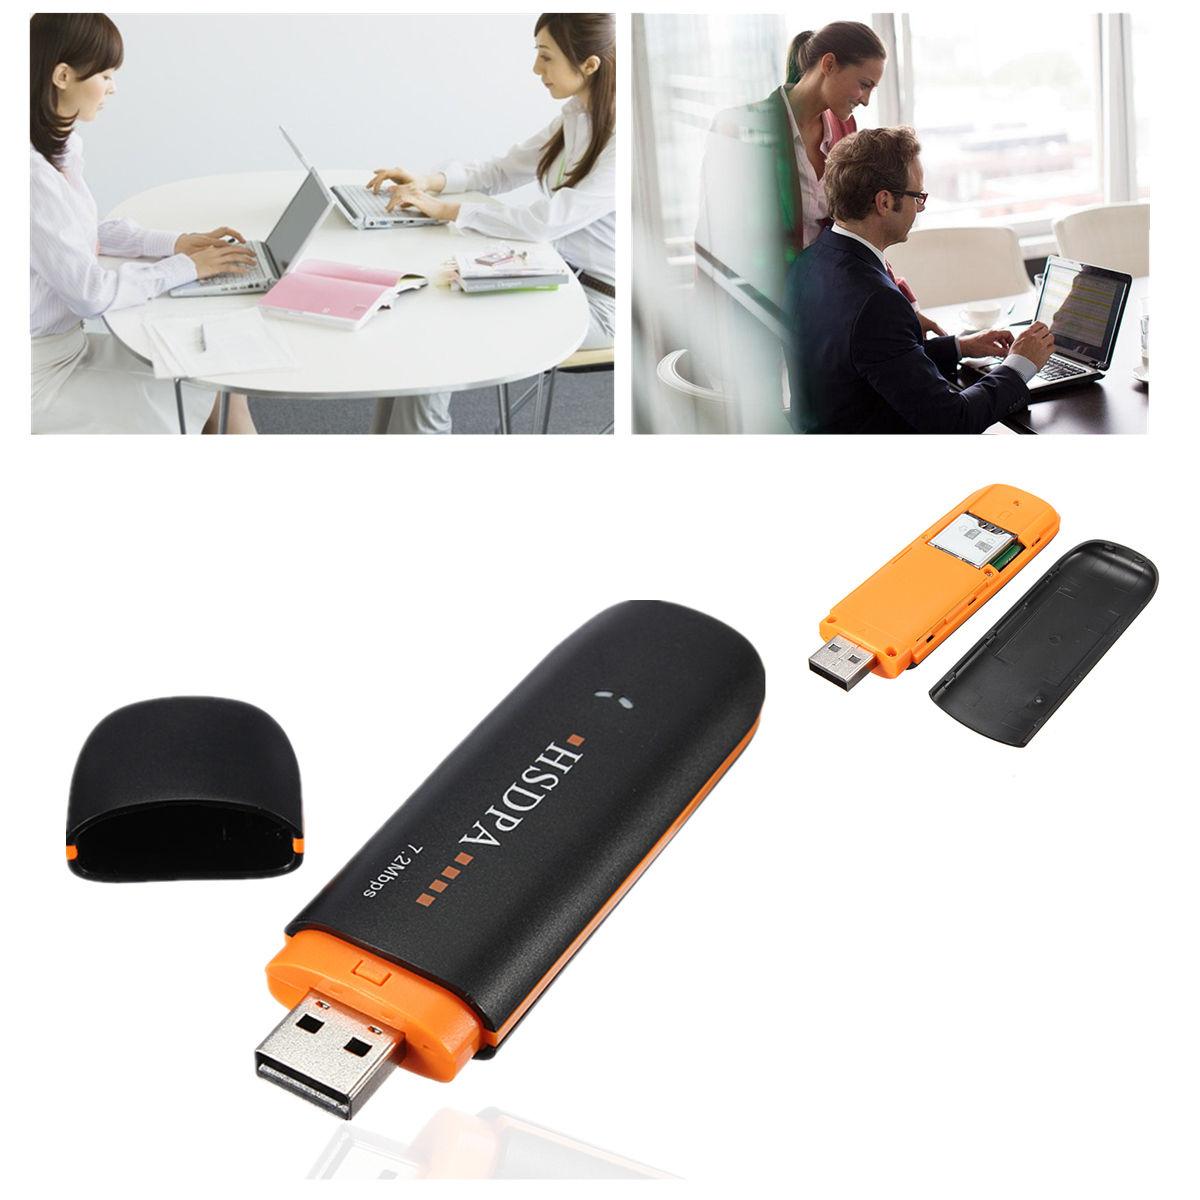 HSDPA EDGE 7.2Mbps Wireless USB2.0 3G Network Modem Adapter TF SIM Card Slot Hot